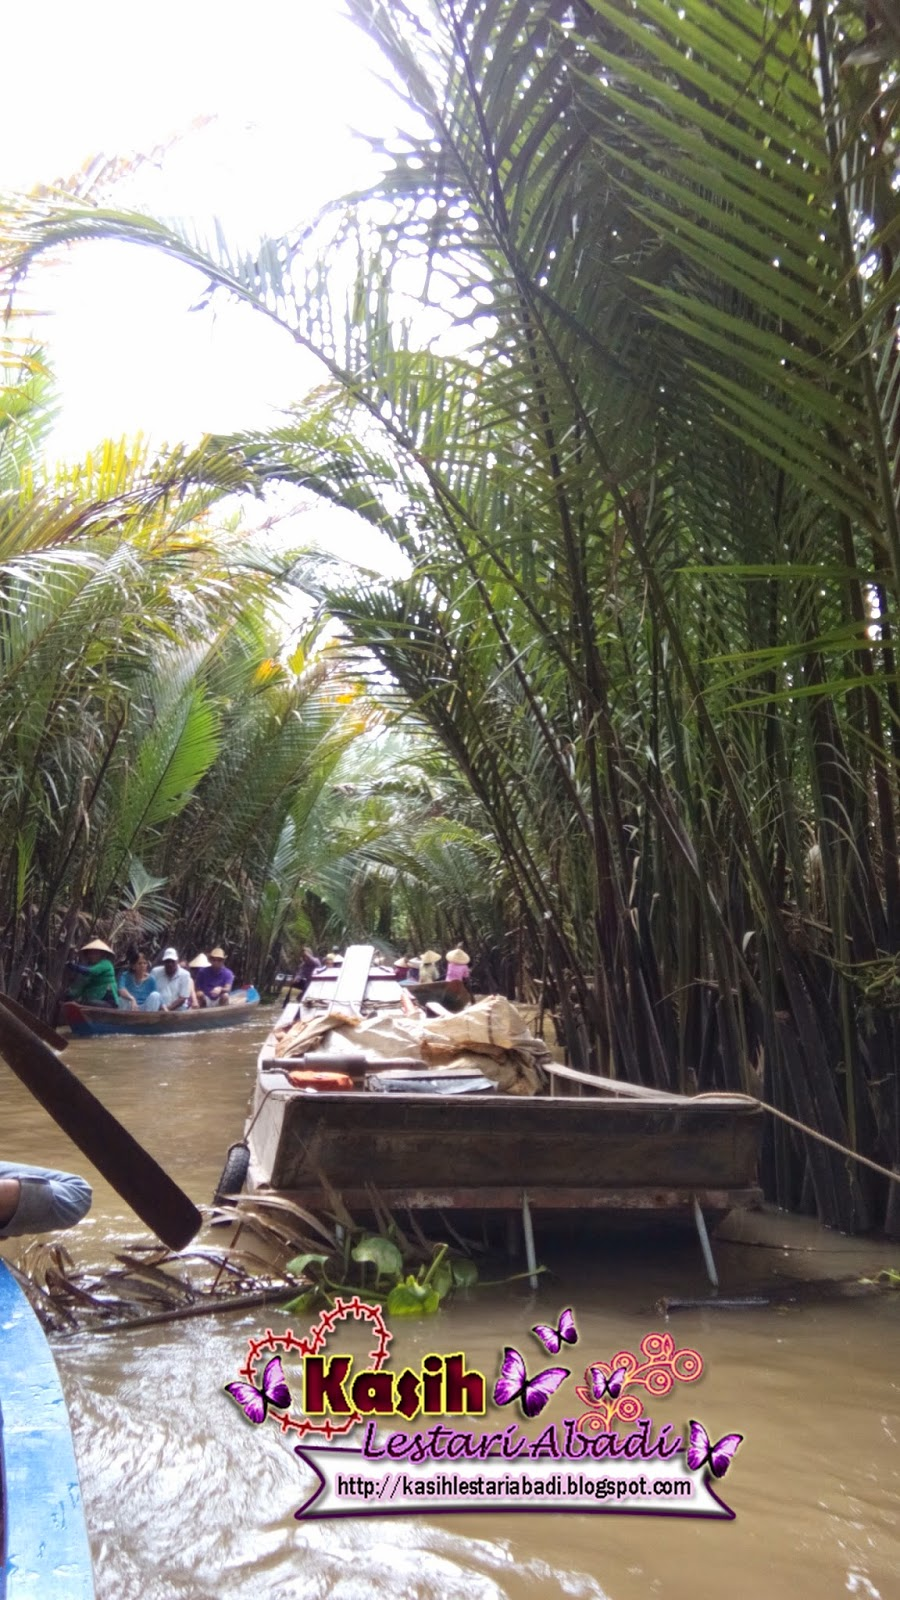 Ho Chi Minh,Sungai Mekong,Kasih lestari Abadi